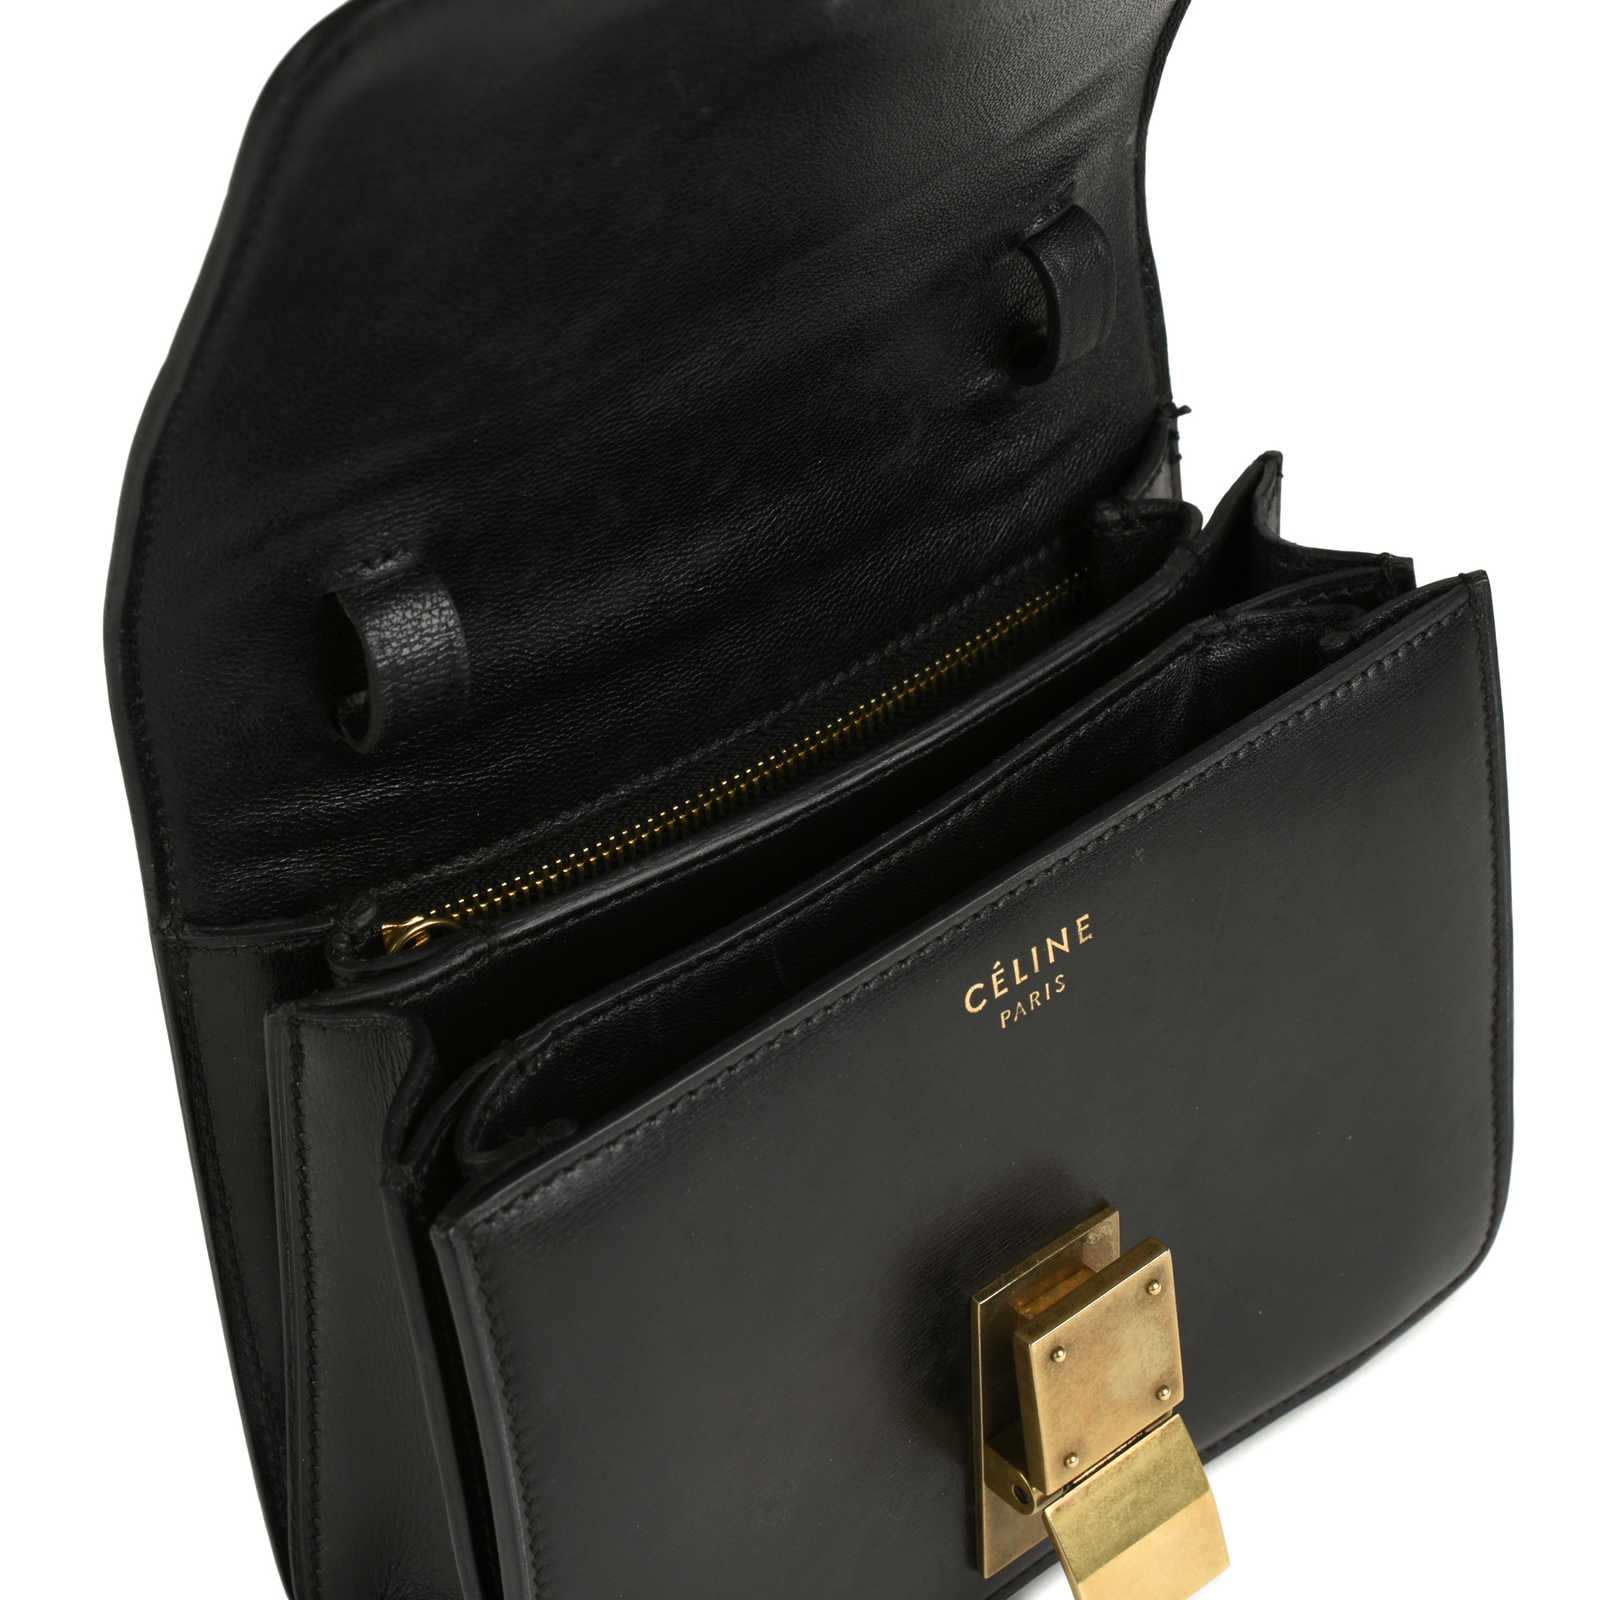 cc8eca9b9fe9 ... Authentic Second Hand Céline Small Box Bag (PSS-429-00003) - Thumbnail